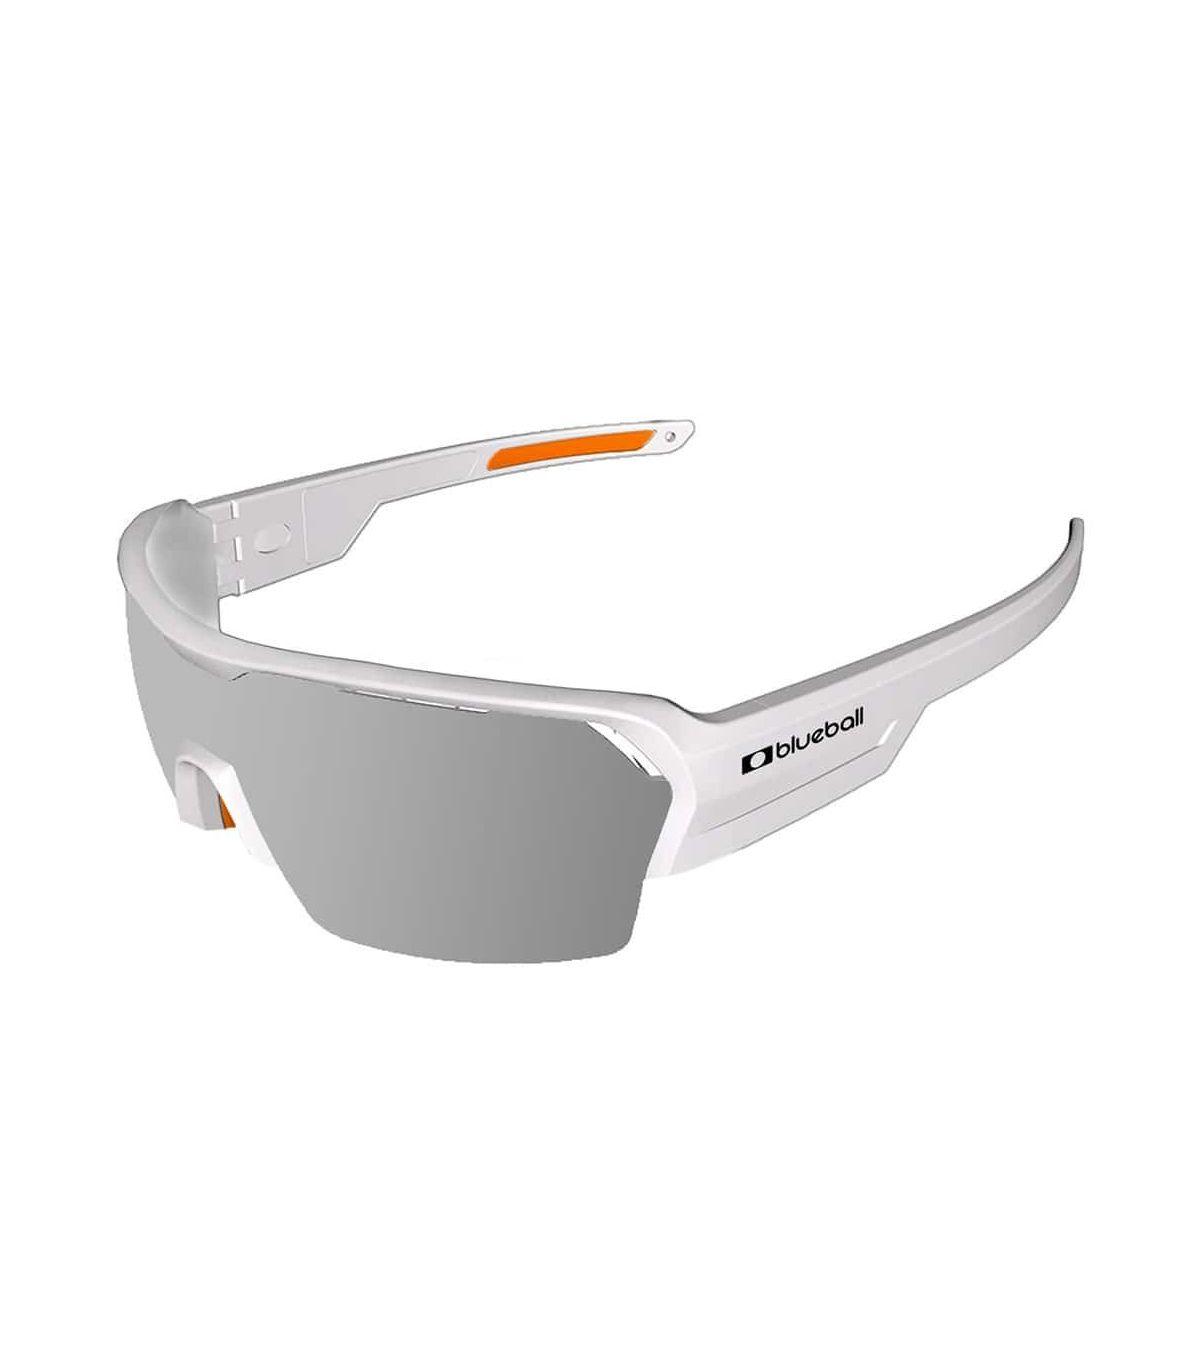 Blueball Aizkorri Matte White / Revo Grey Blueball Gafas de Sol Sport Gafas de Sol Color: blanco